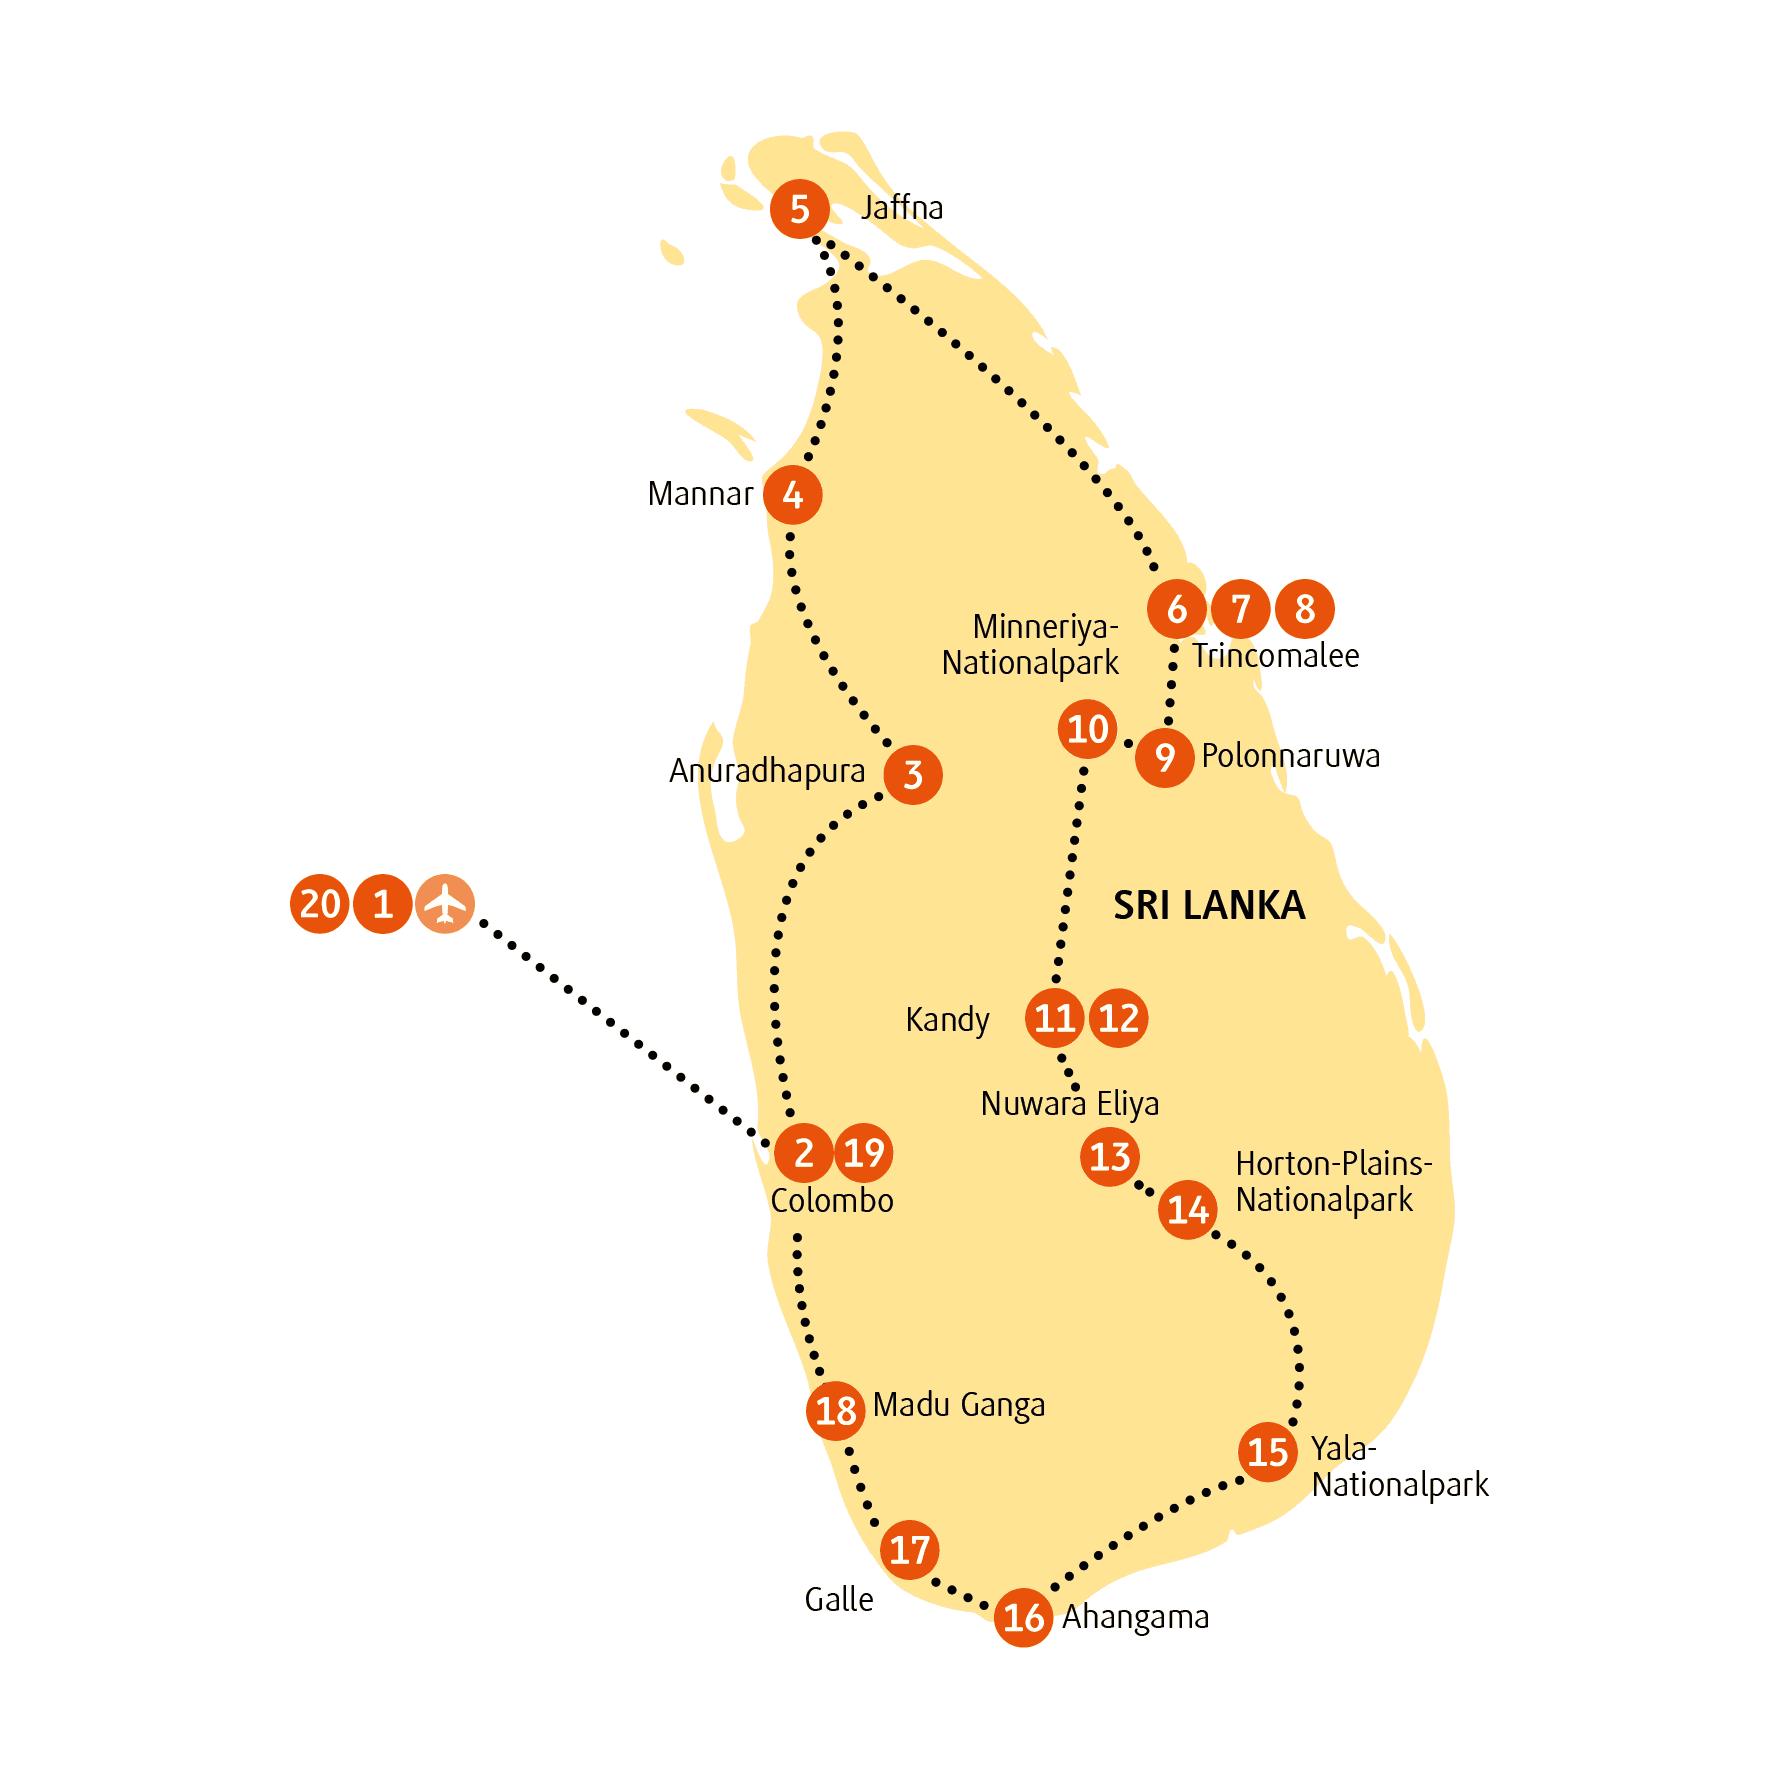 Reiseroute Sri Lanka Sapphire Sense Von Chamaleon 20 Tage Geniessen Sri Lanka Reisen Roadtrip